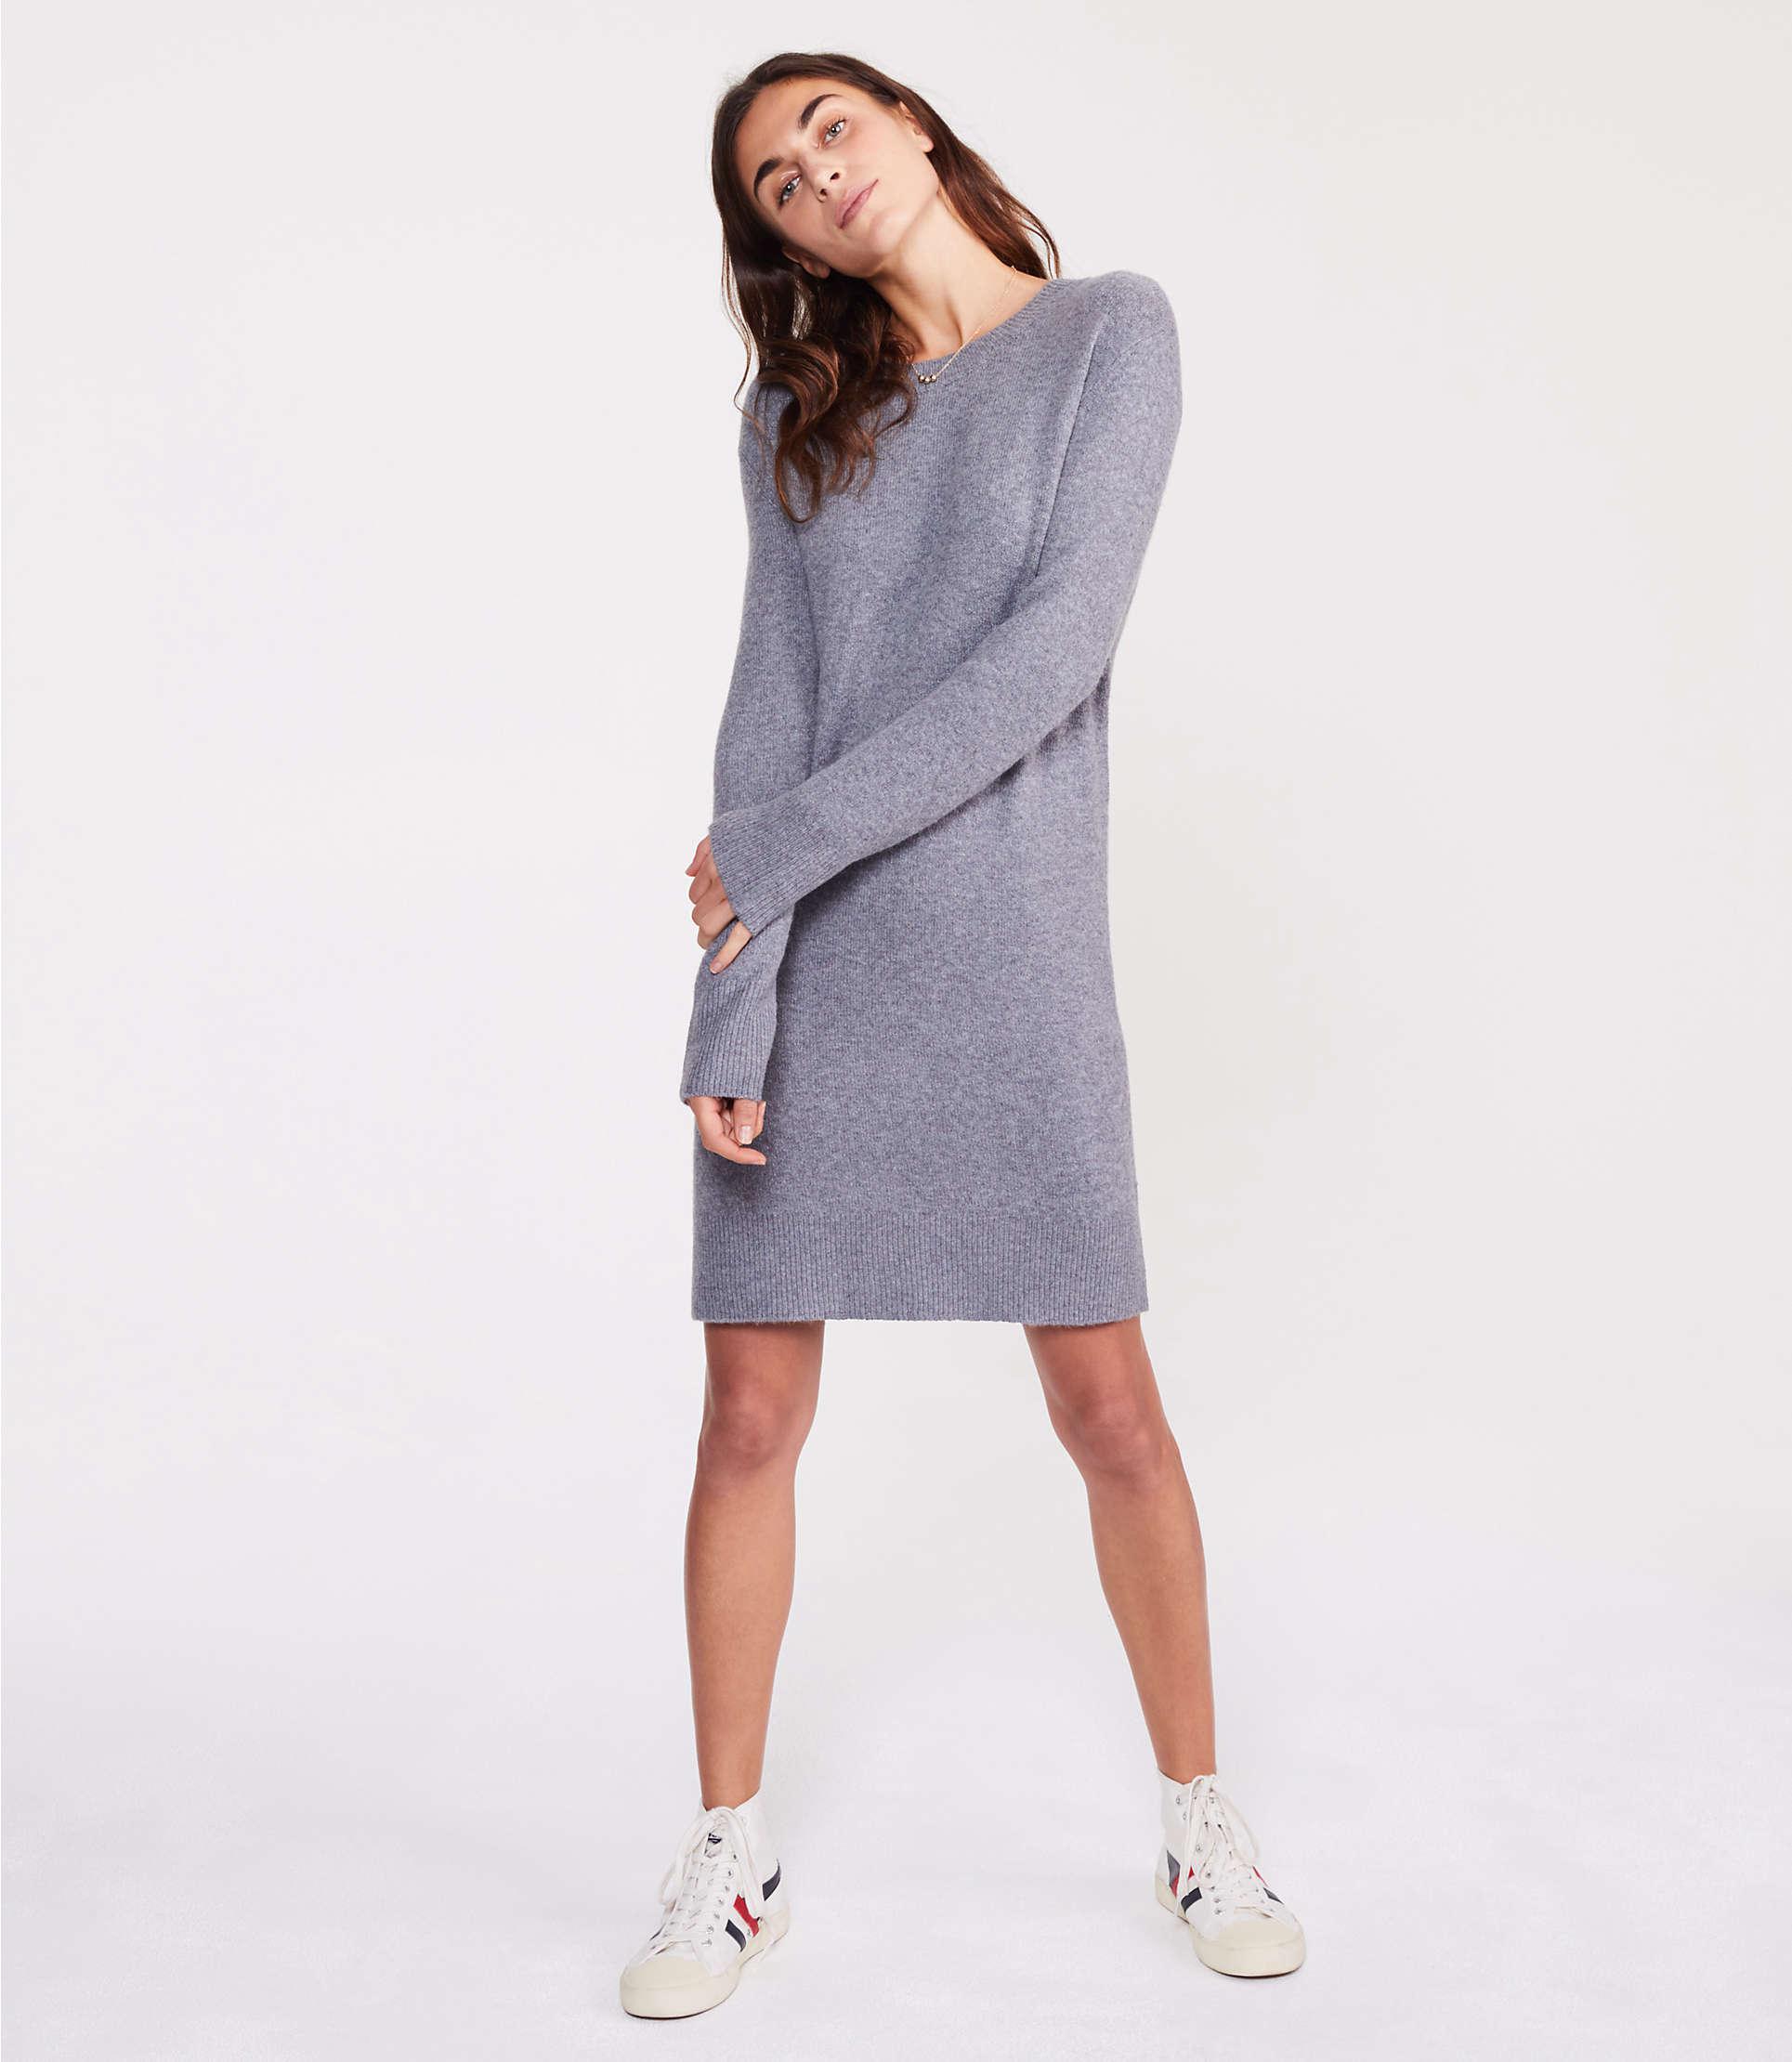 976a7790af2 ... Lou   Grey Sweater Dress - Lyst. View fullscreen